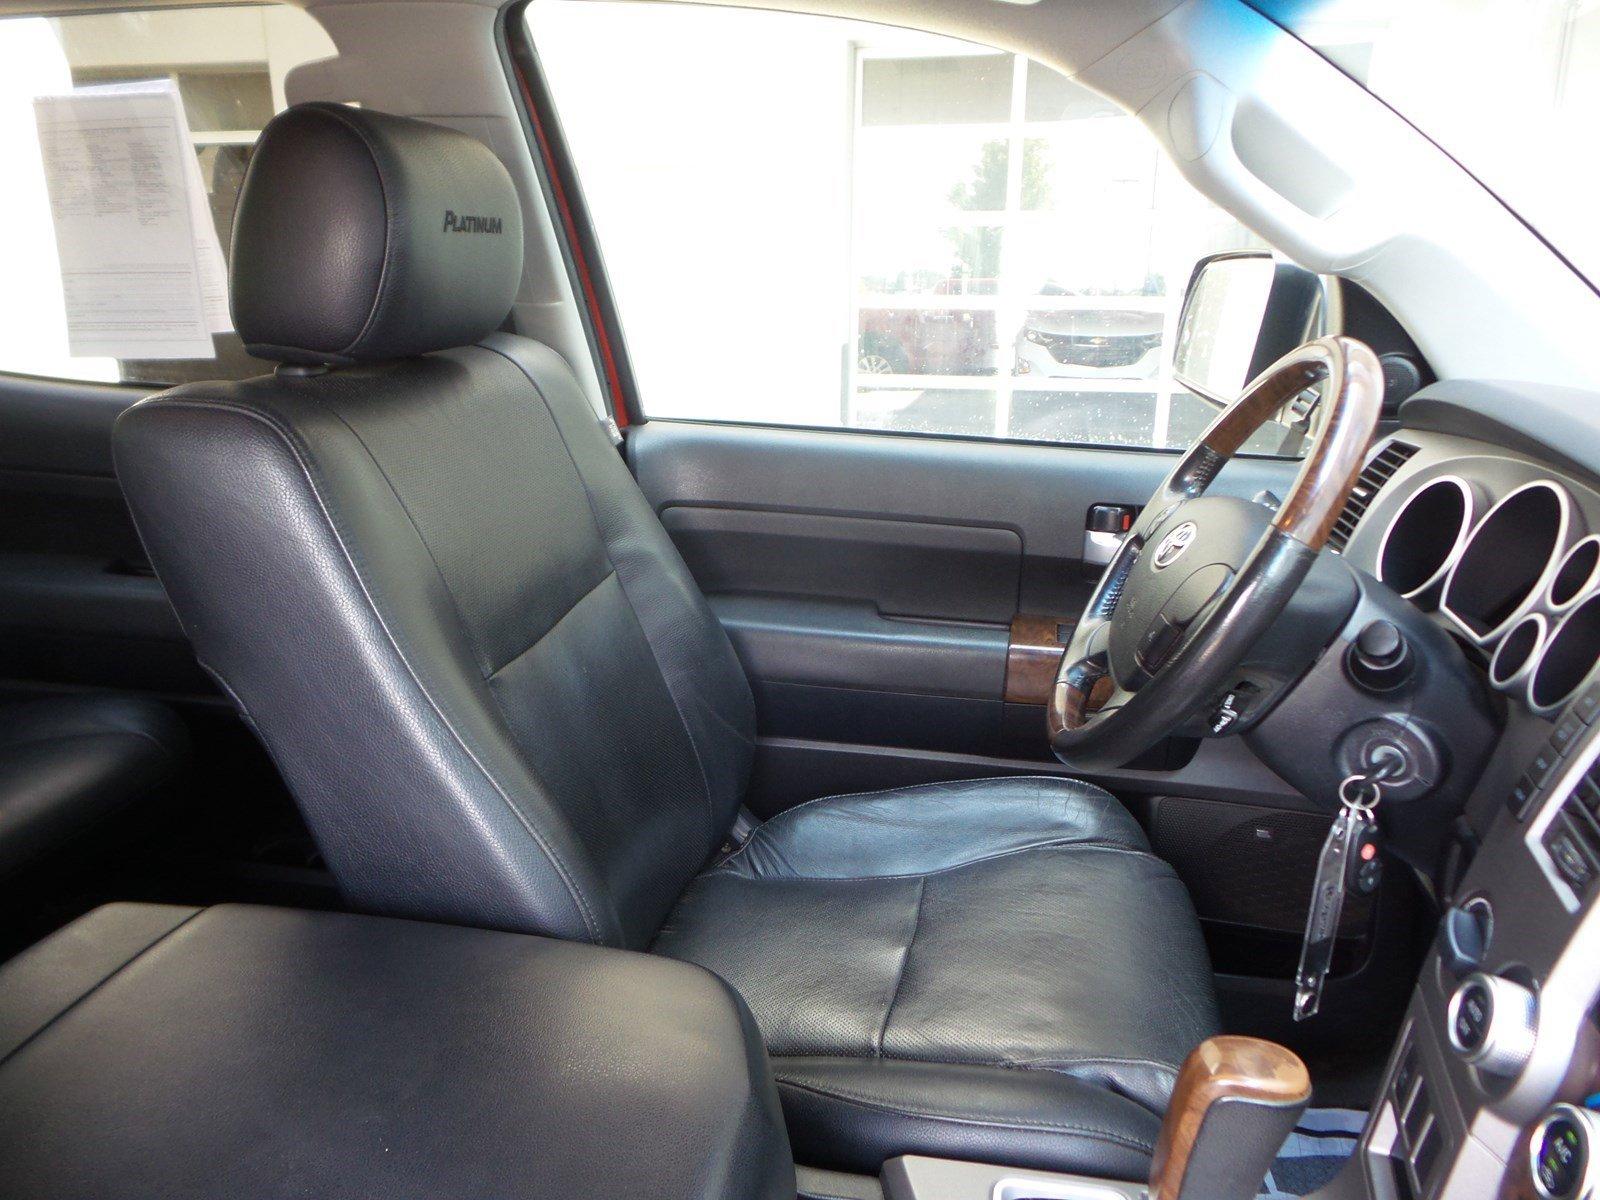 Pre-Owned 2013 Toyota Tundra 4WD Truck LTD